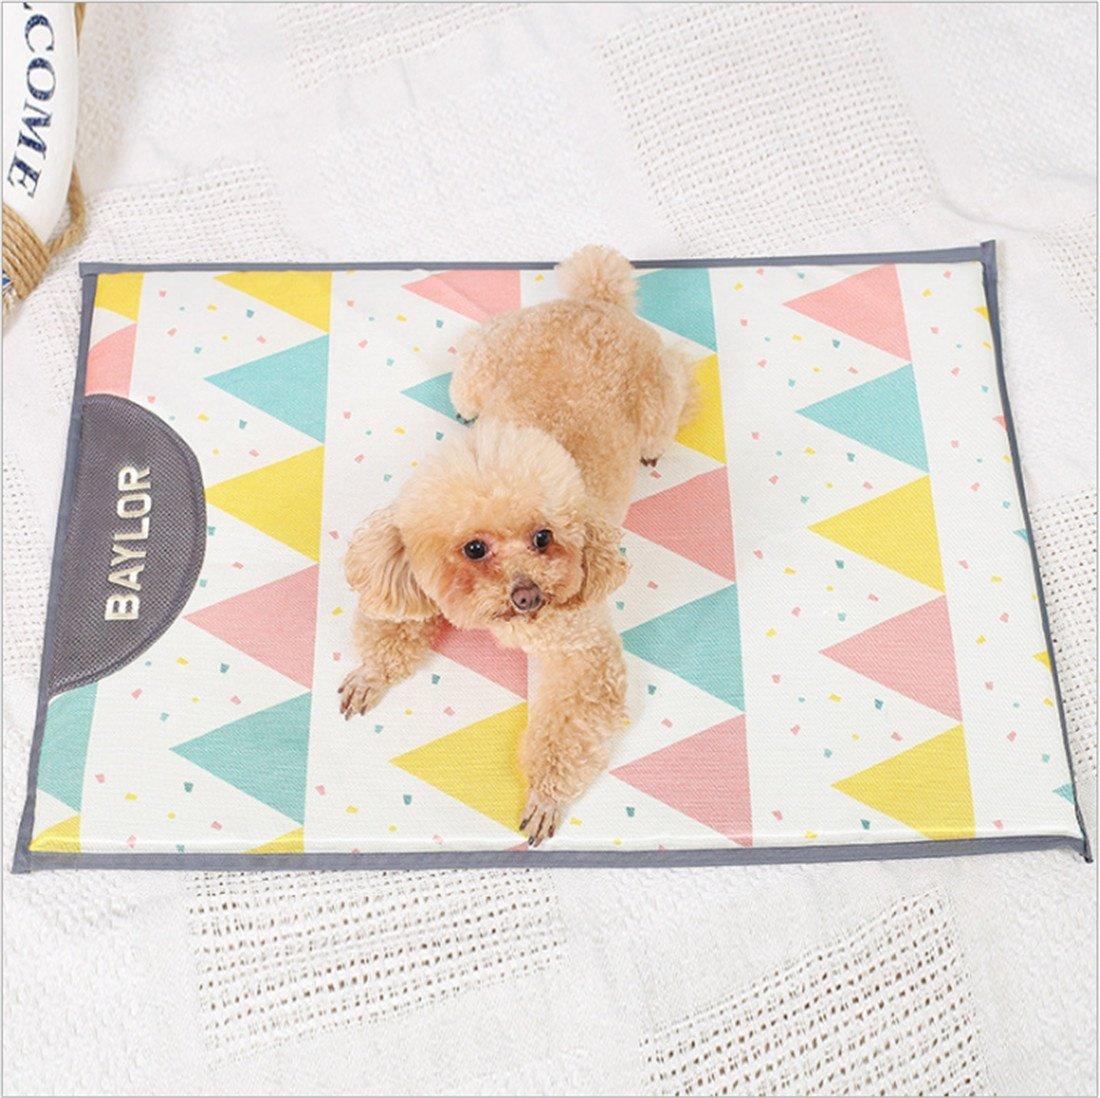 CHWWO Ice Silk pet Mattress Cool Summer Breathable Kennel Cushion Washable Non-Slip Sleeping pad 60  43cm